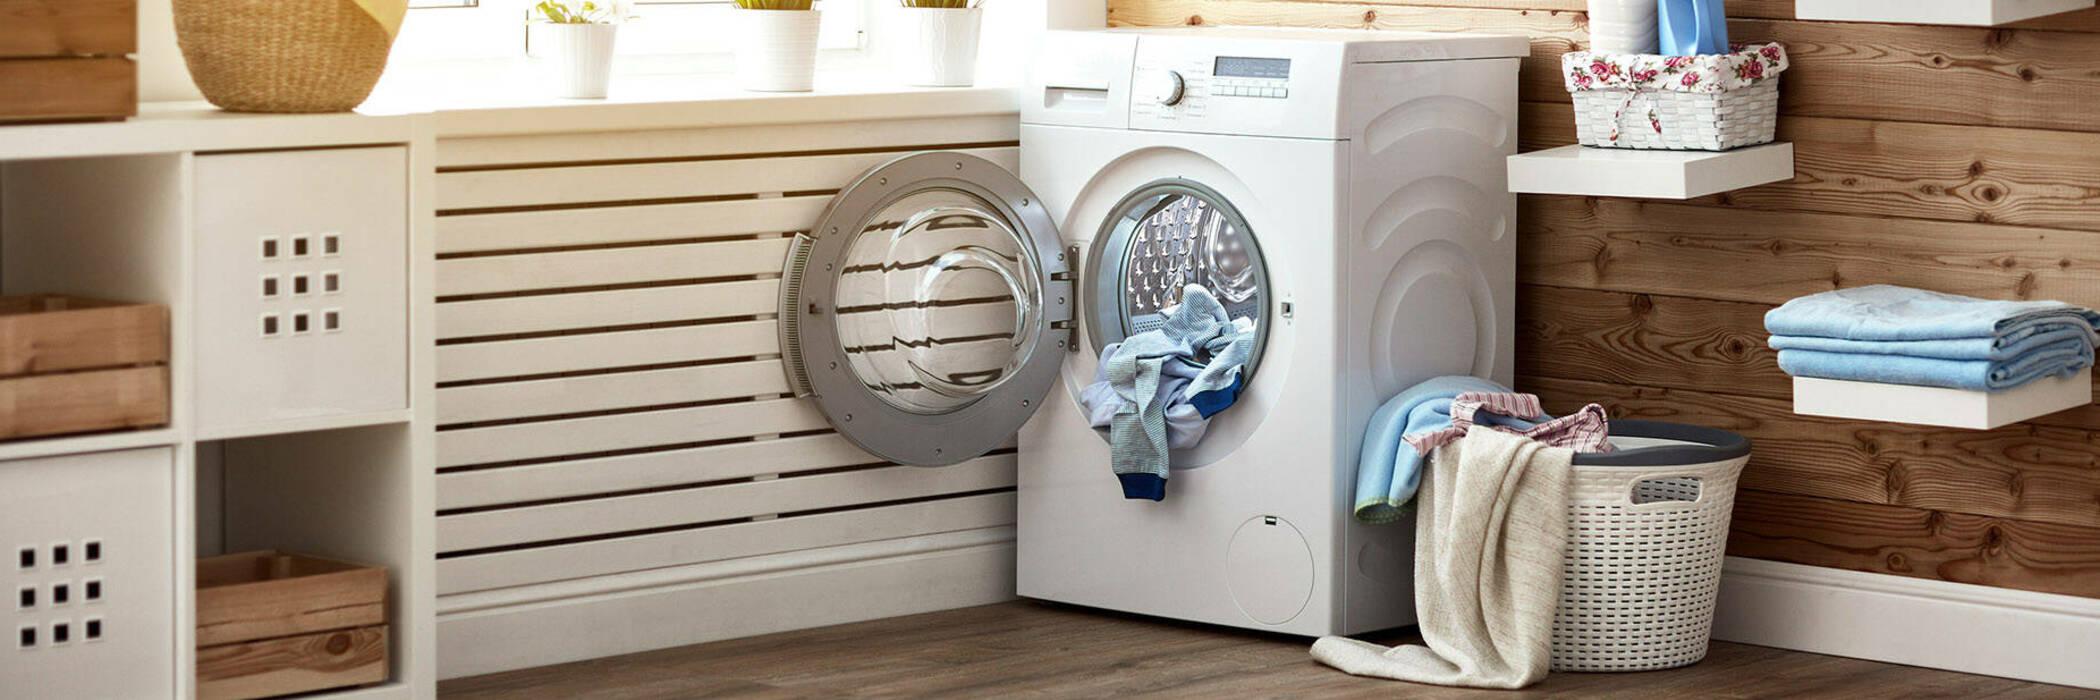 Washing machine filled with laundry